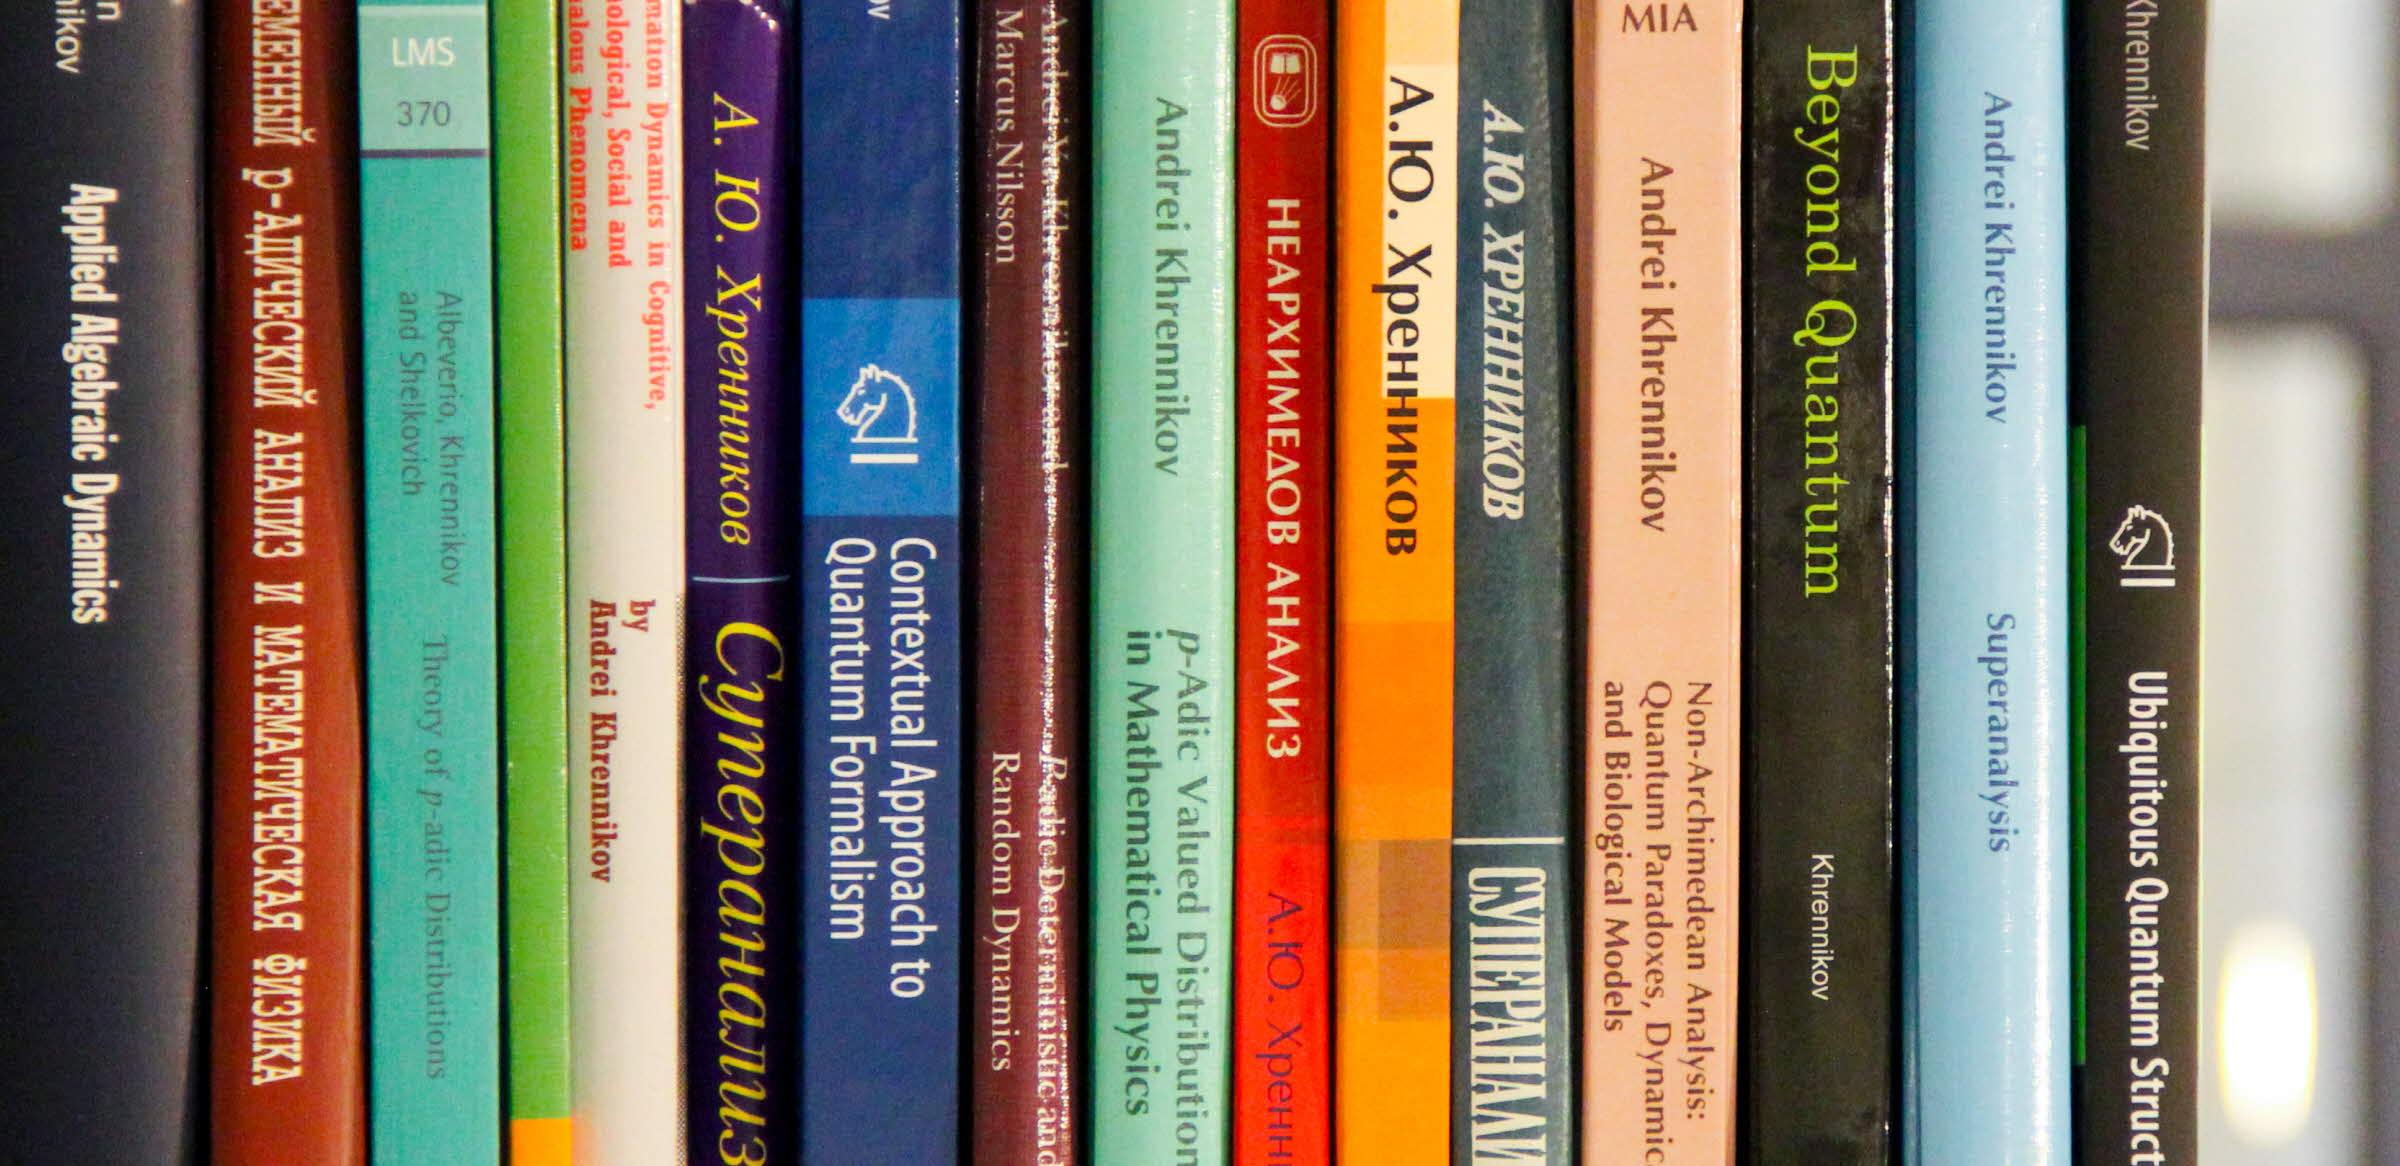 International Center for Mathematical Modeling | Lnu se